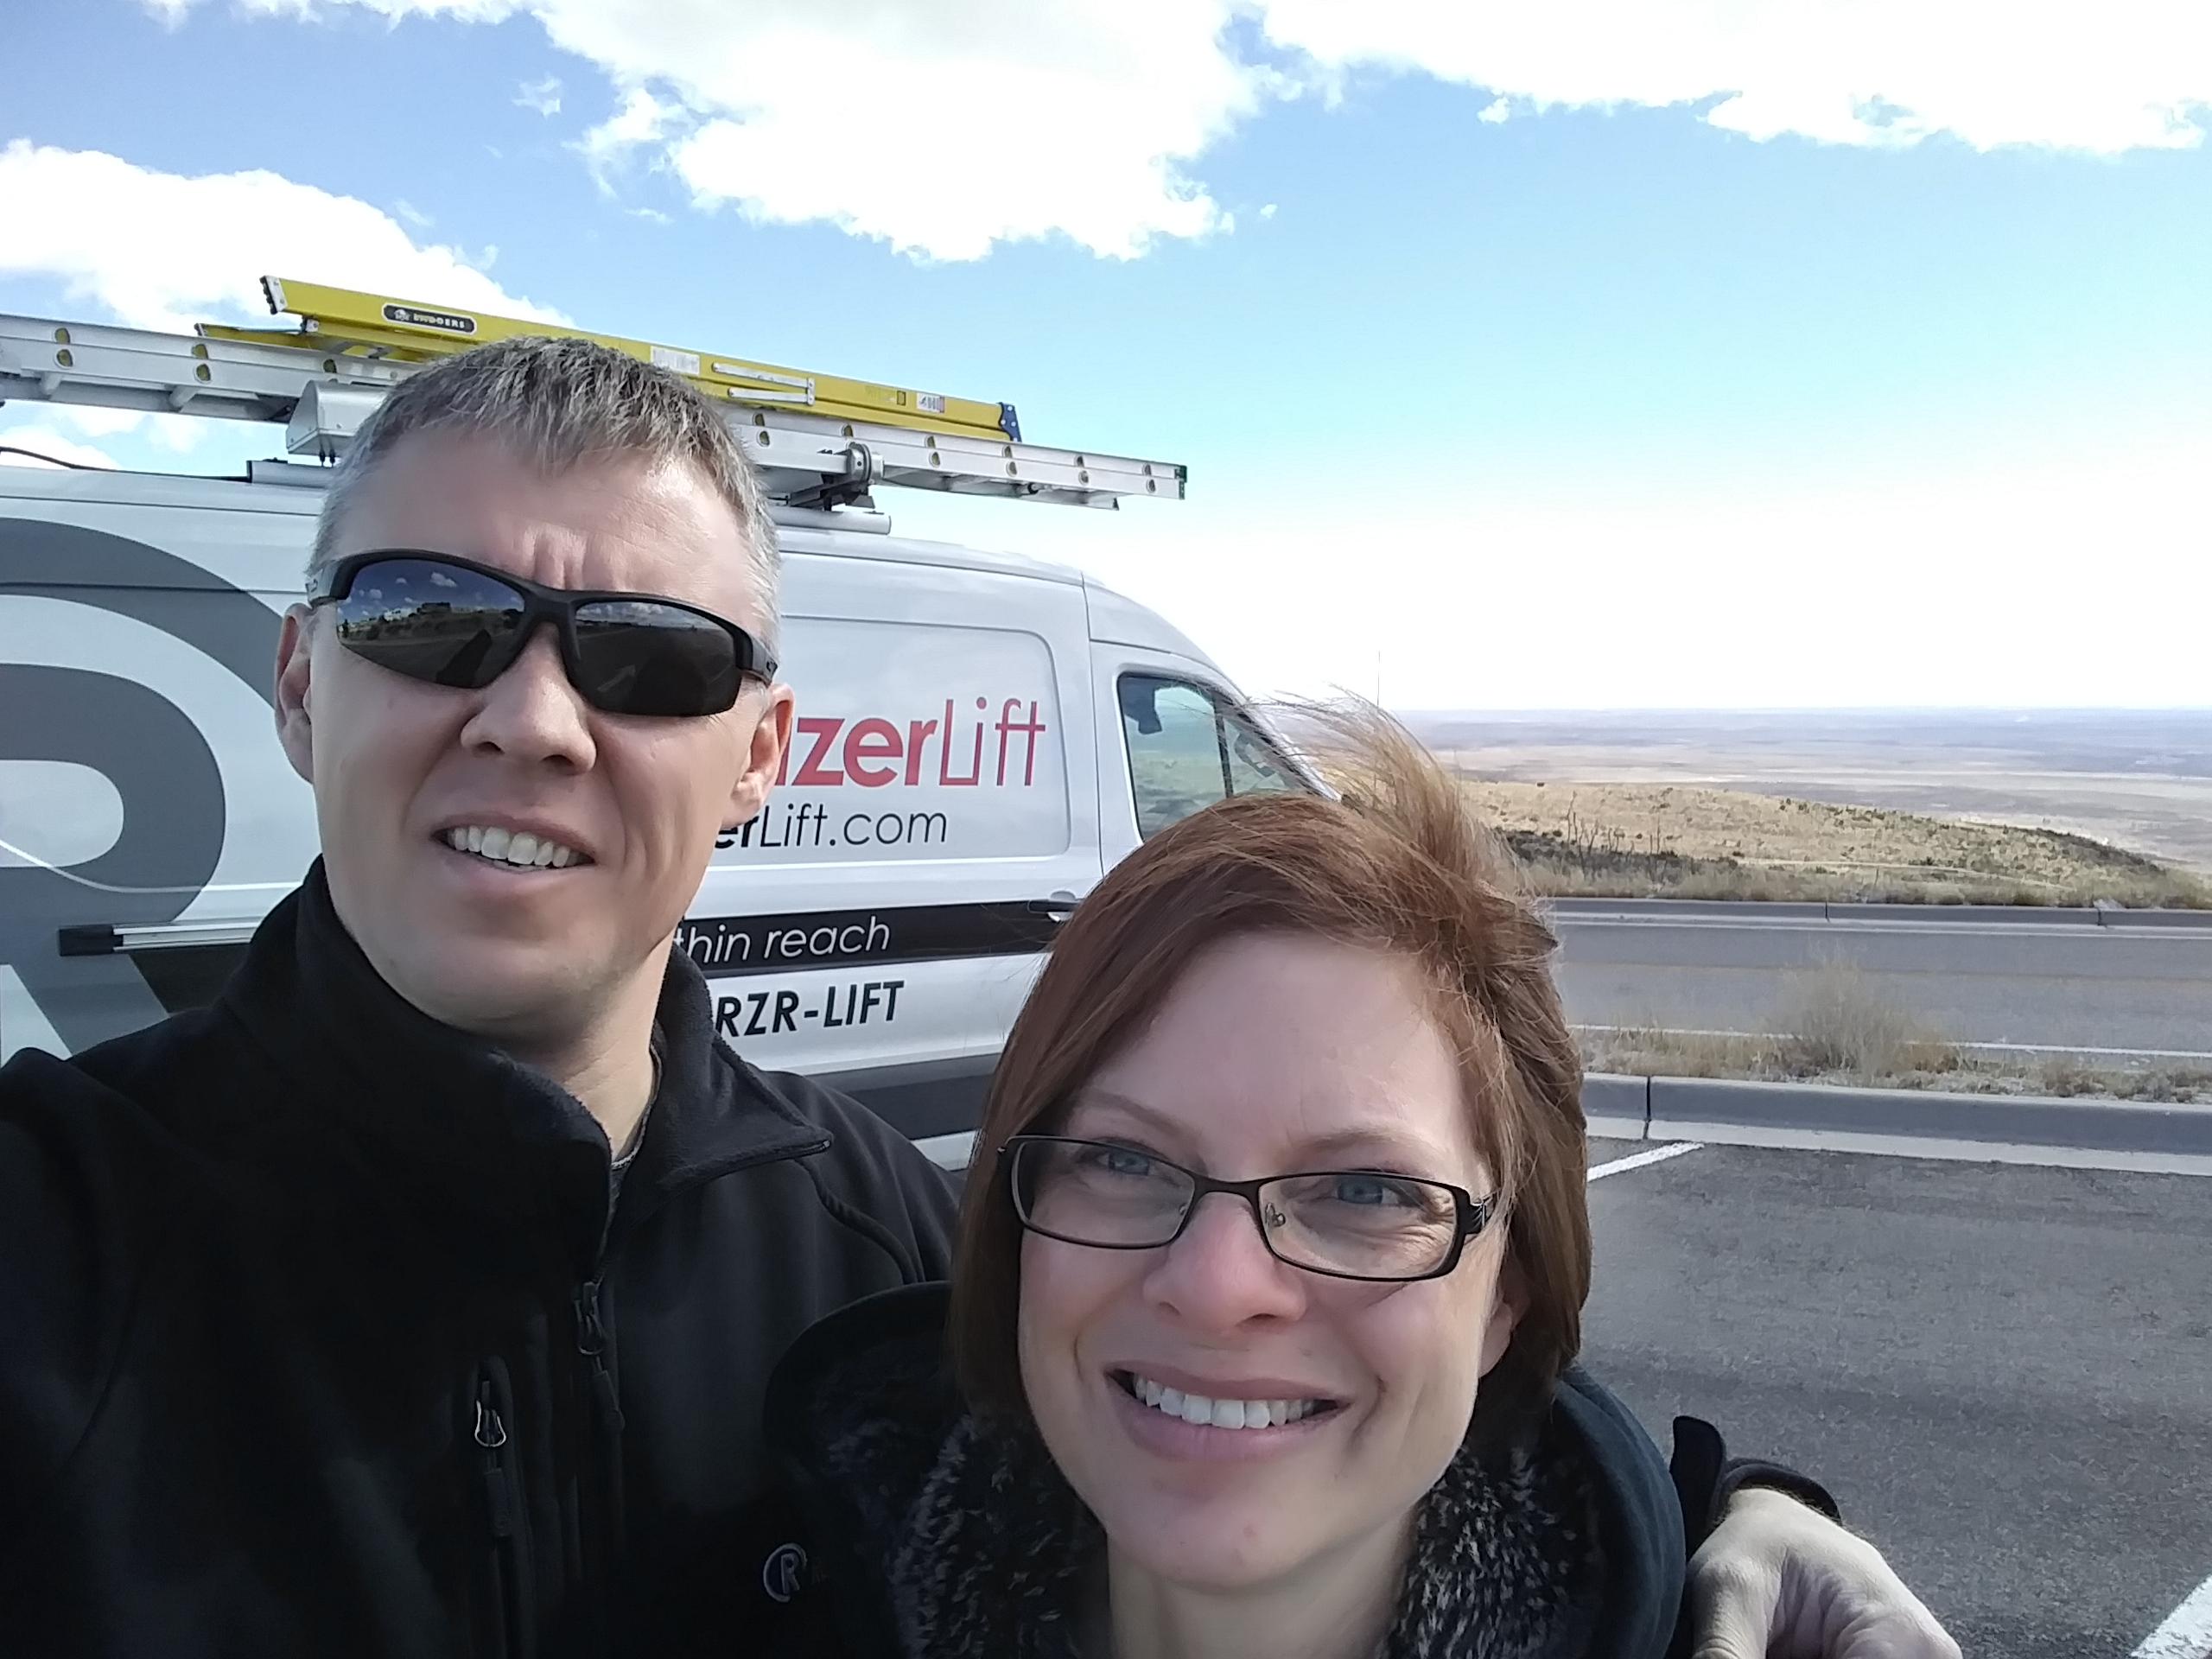 RazerLift roadtrip 2019 – my leg of the trip